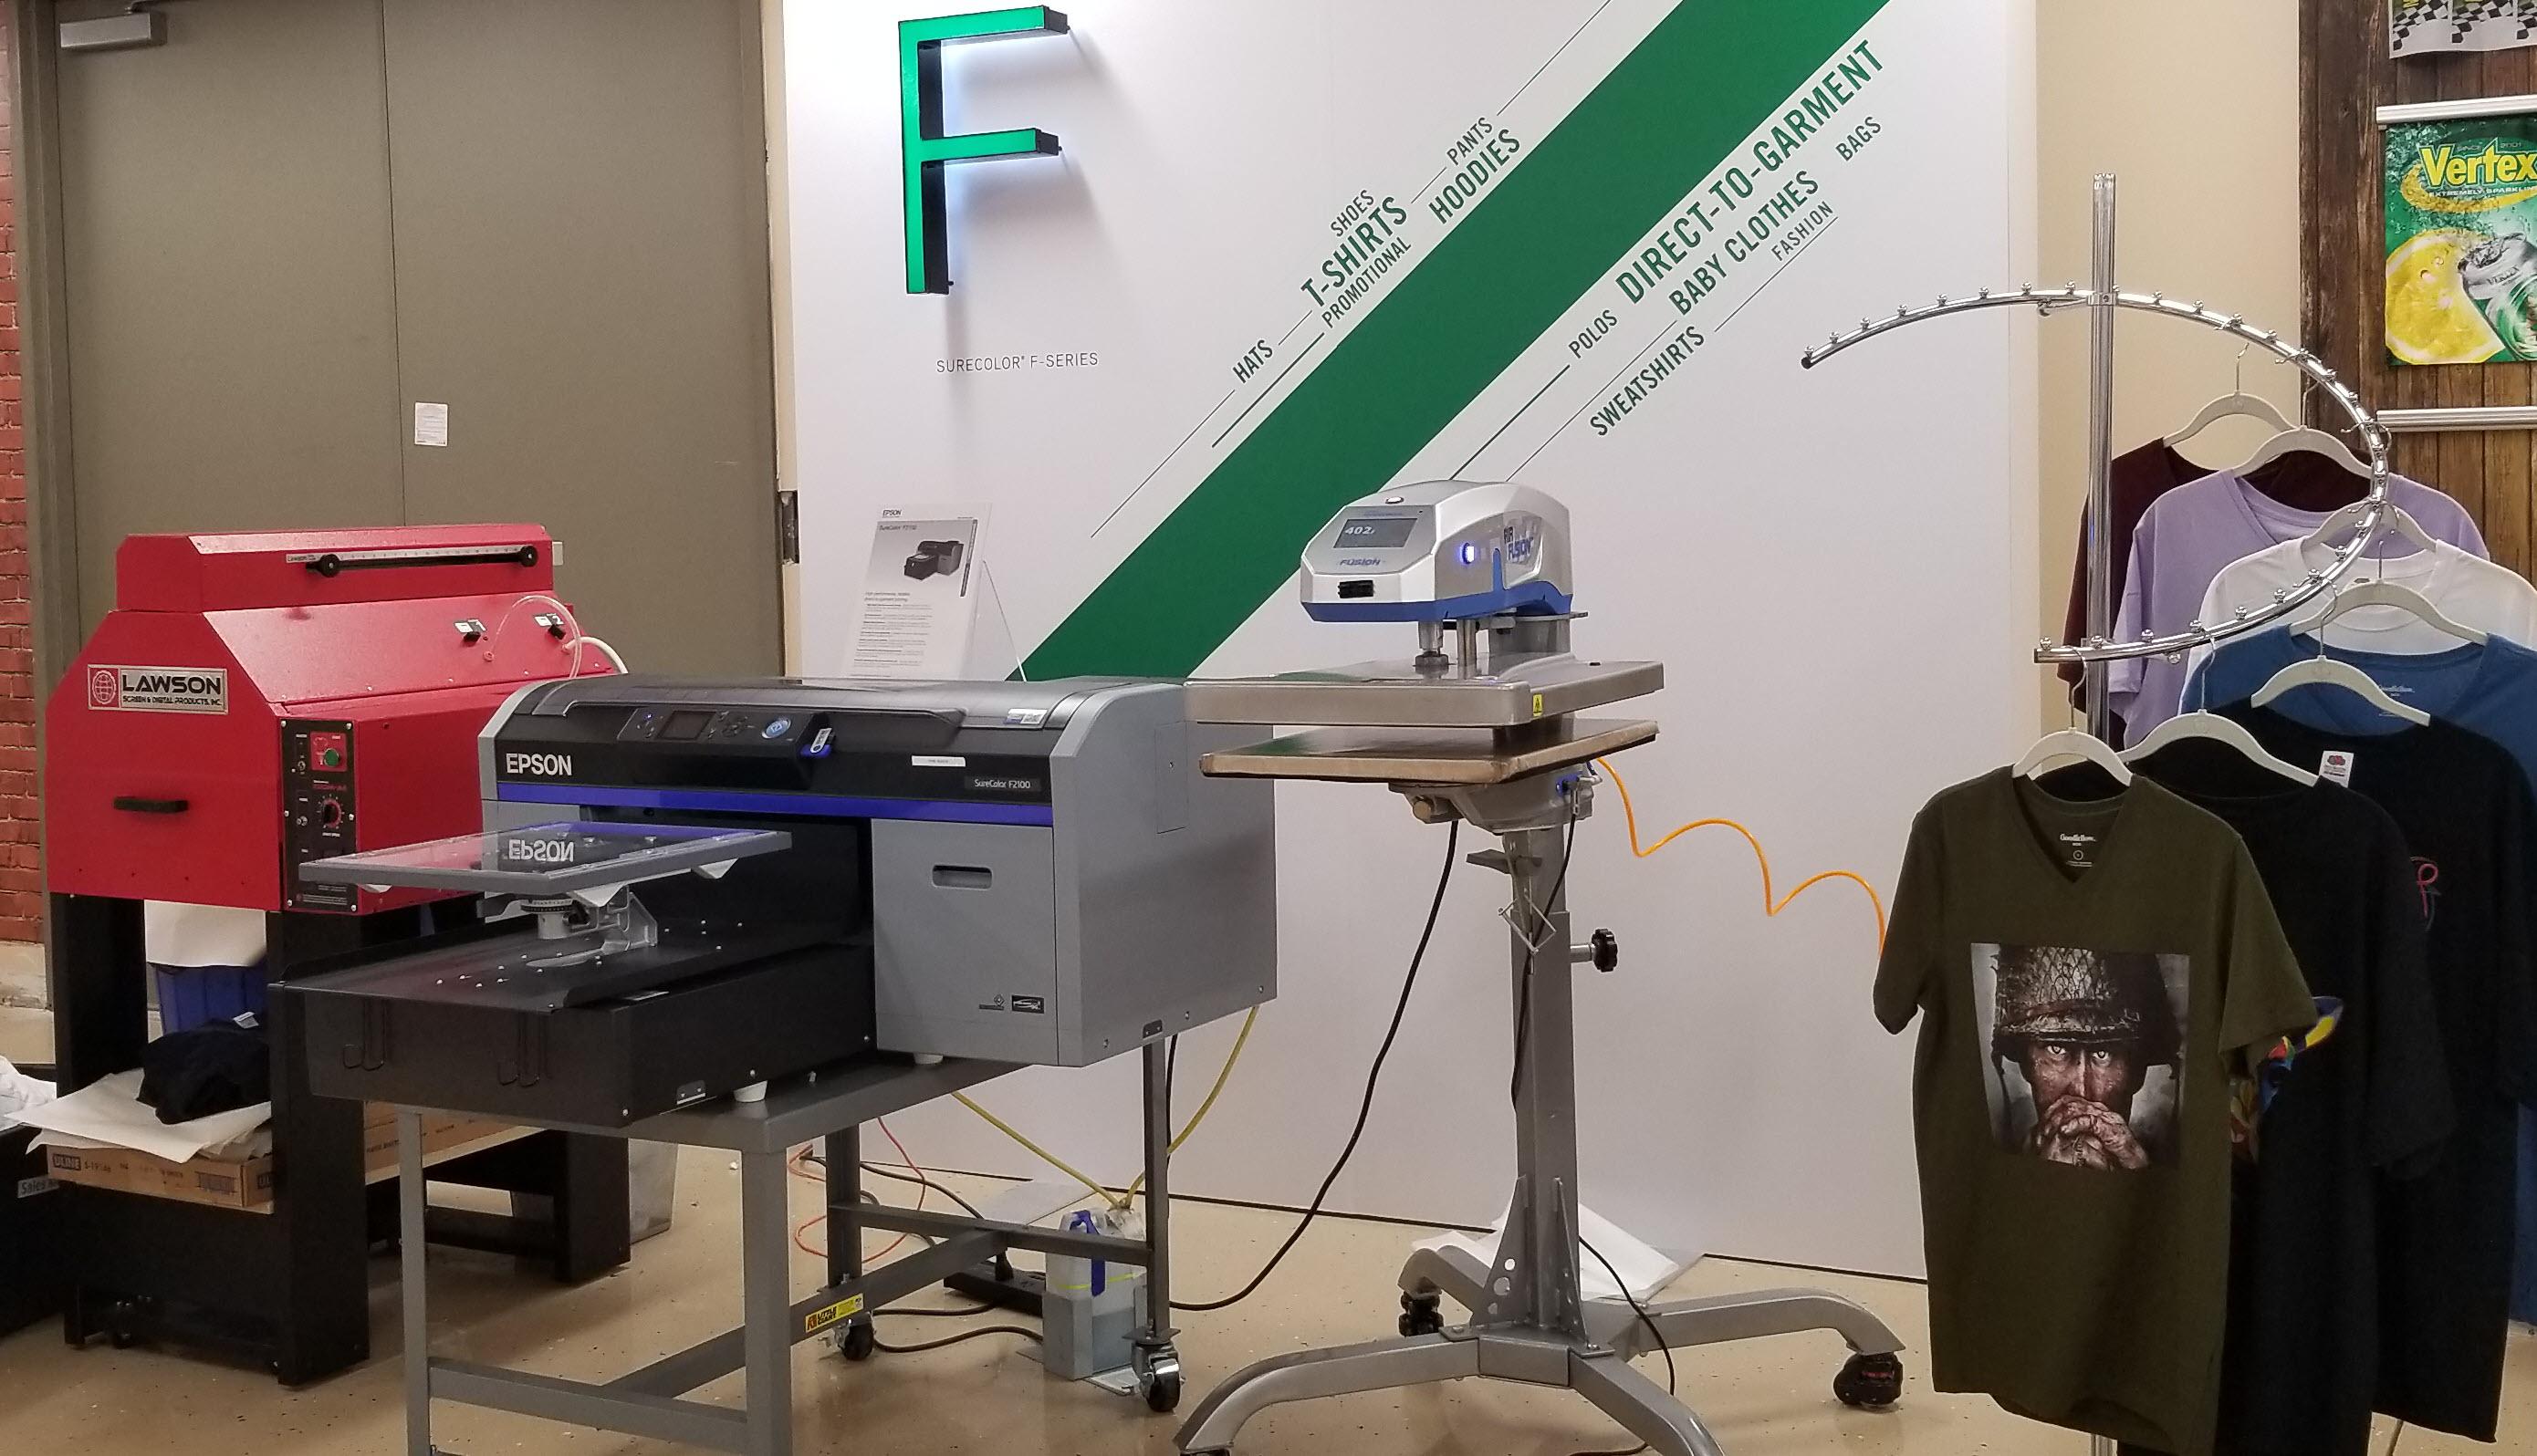 0b1e7f57e Epson SureColor F2100 W DTG Direct to Garment Printer for Darker and ...